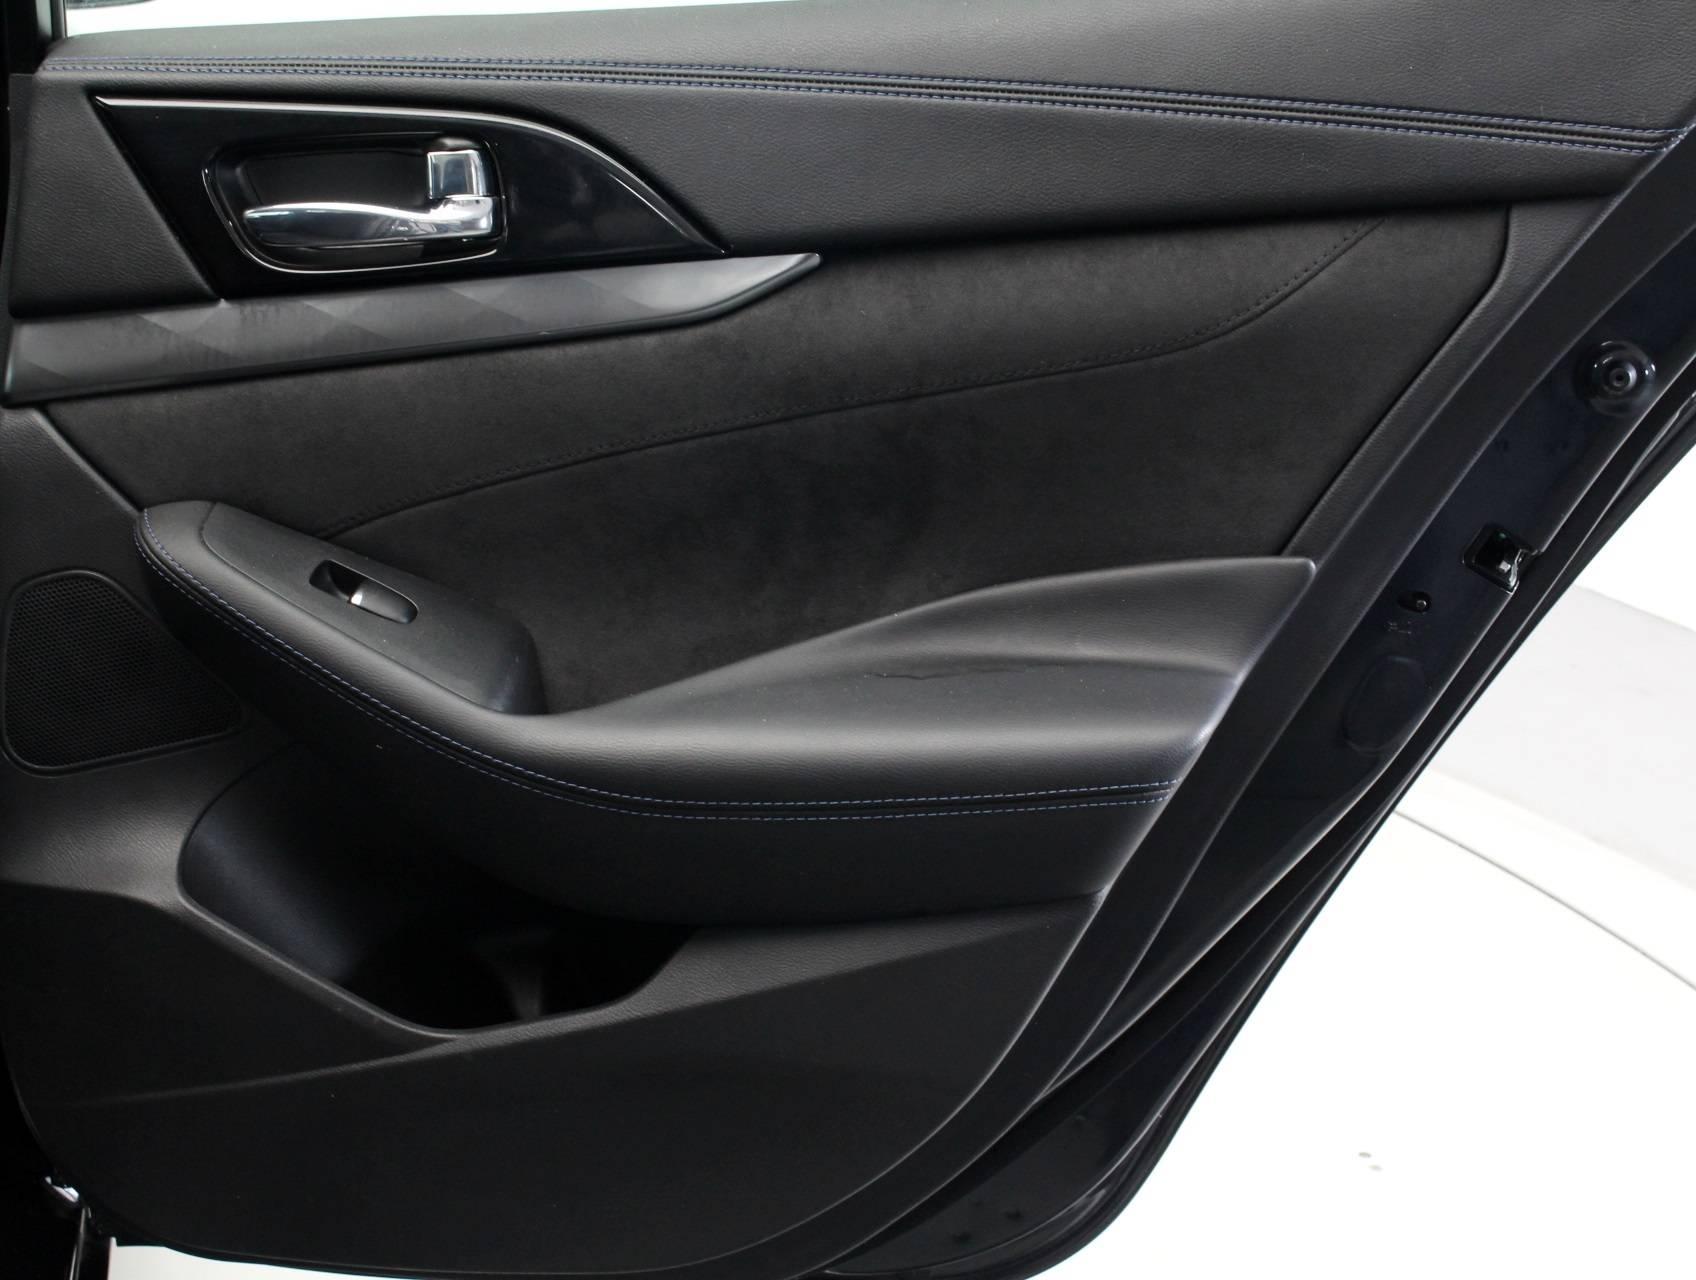 Used 2016 NISSAN MAXIMA Sr Sedan for sale in WEST PALM, FL ...